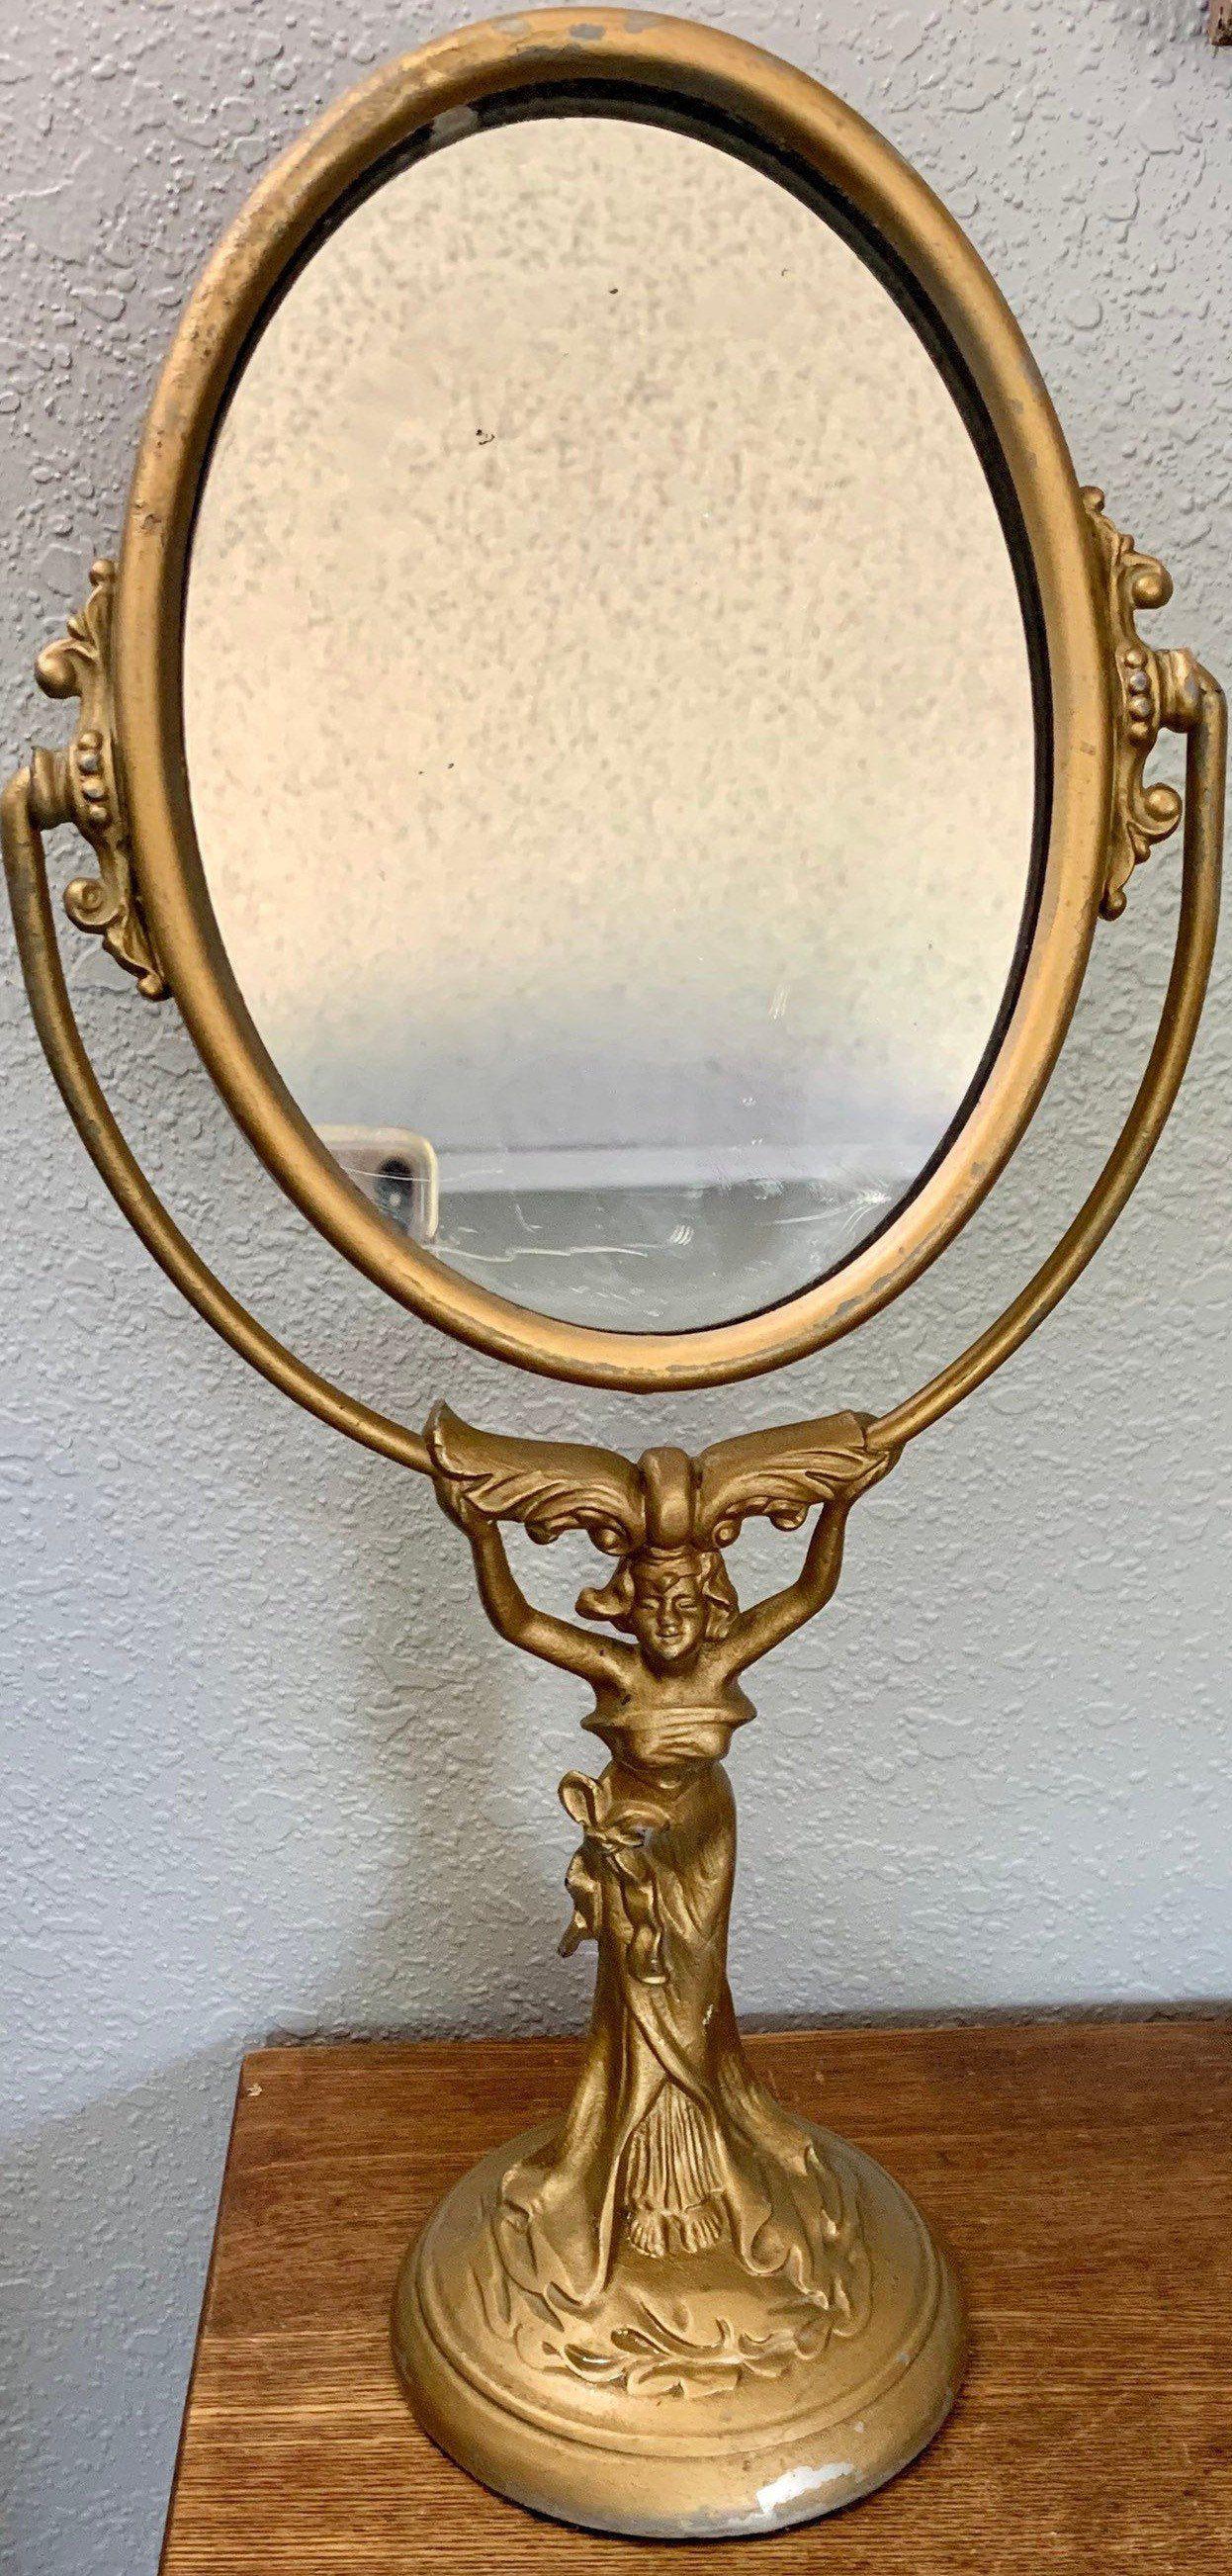 Art nuevo antique decorative mirror vintage gold bronze